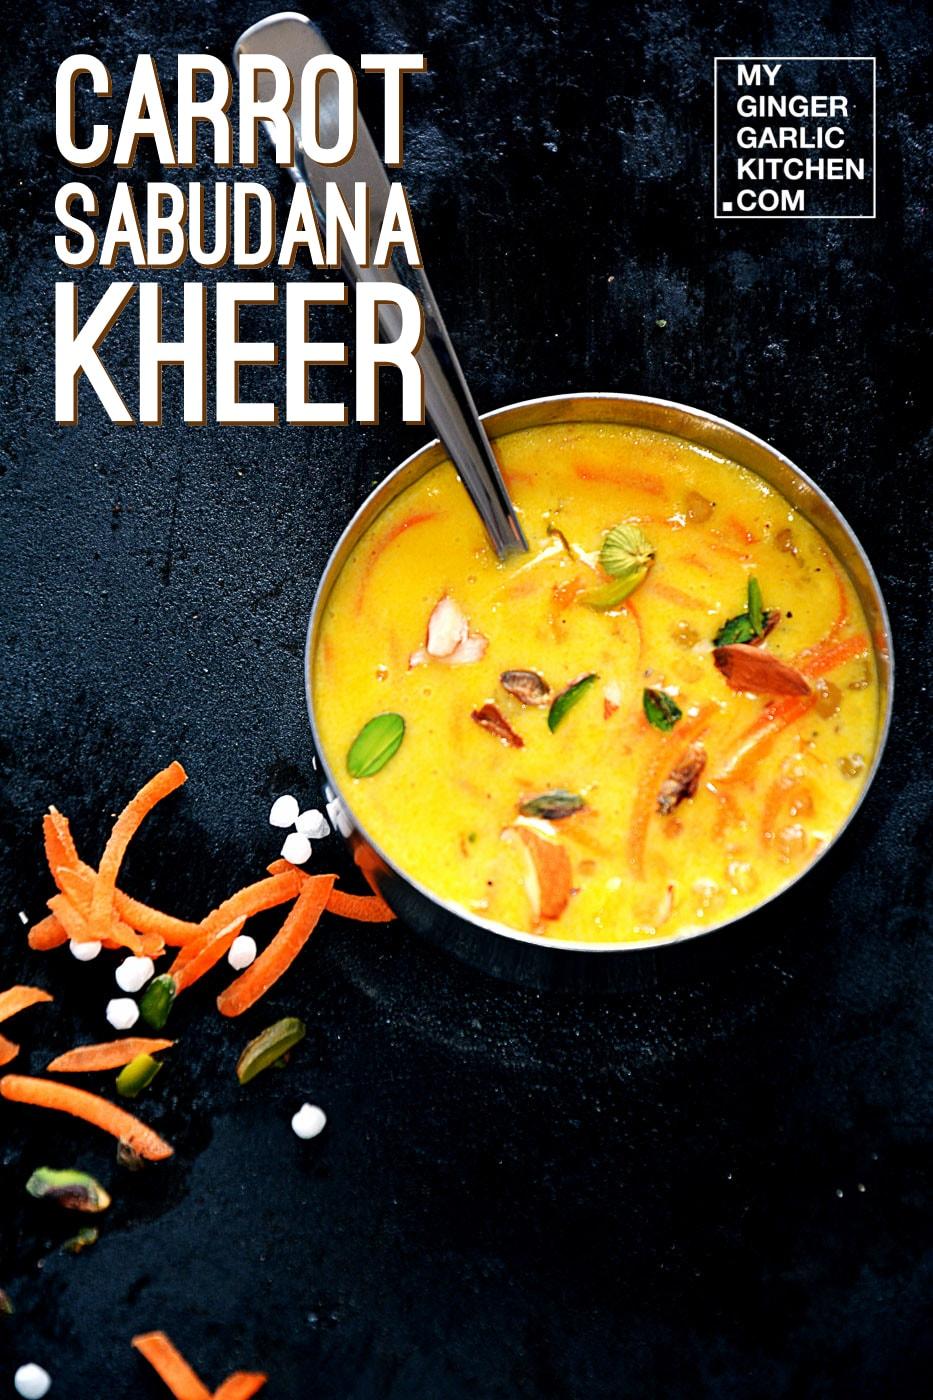 Image - recipe carrot sabudana kheer anupama paliwal 1